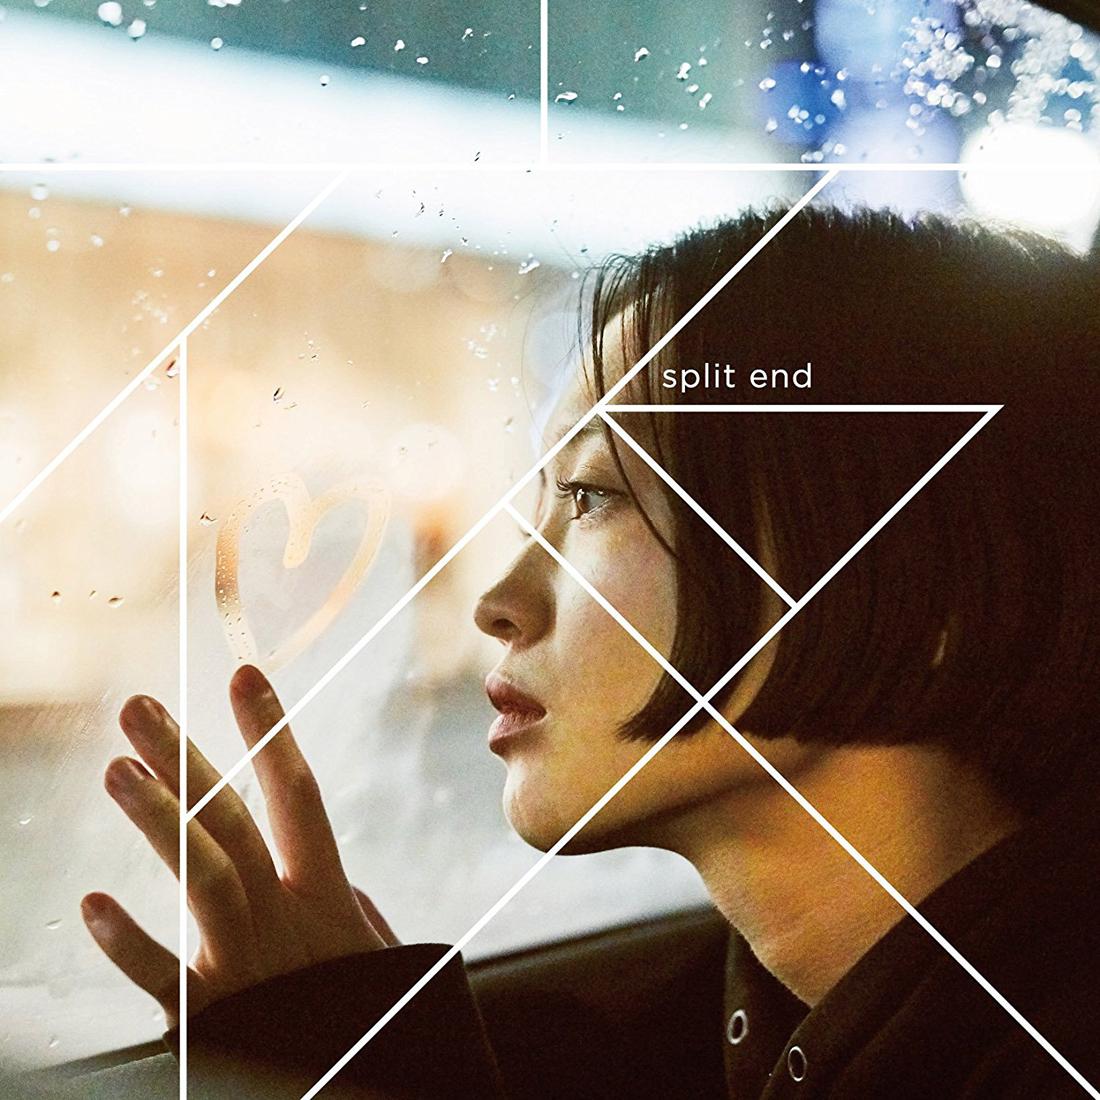 20180317.0826.09 Split end - Yoru cover.jpg